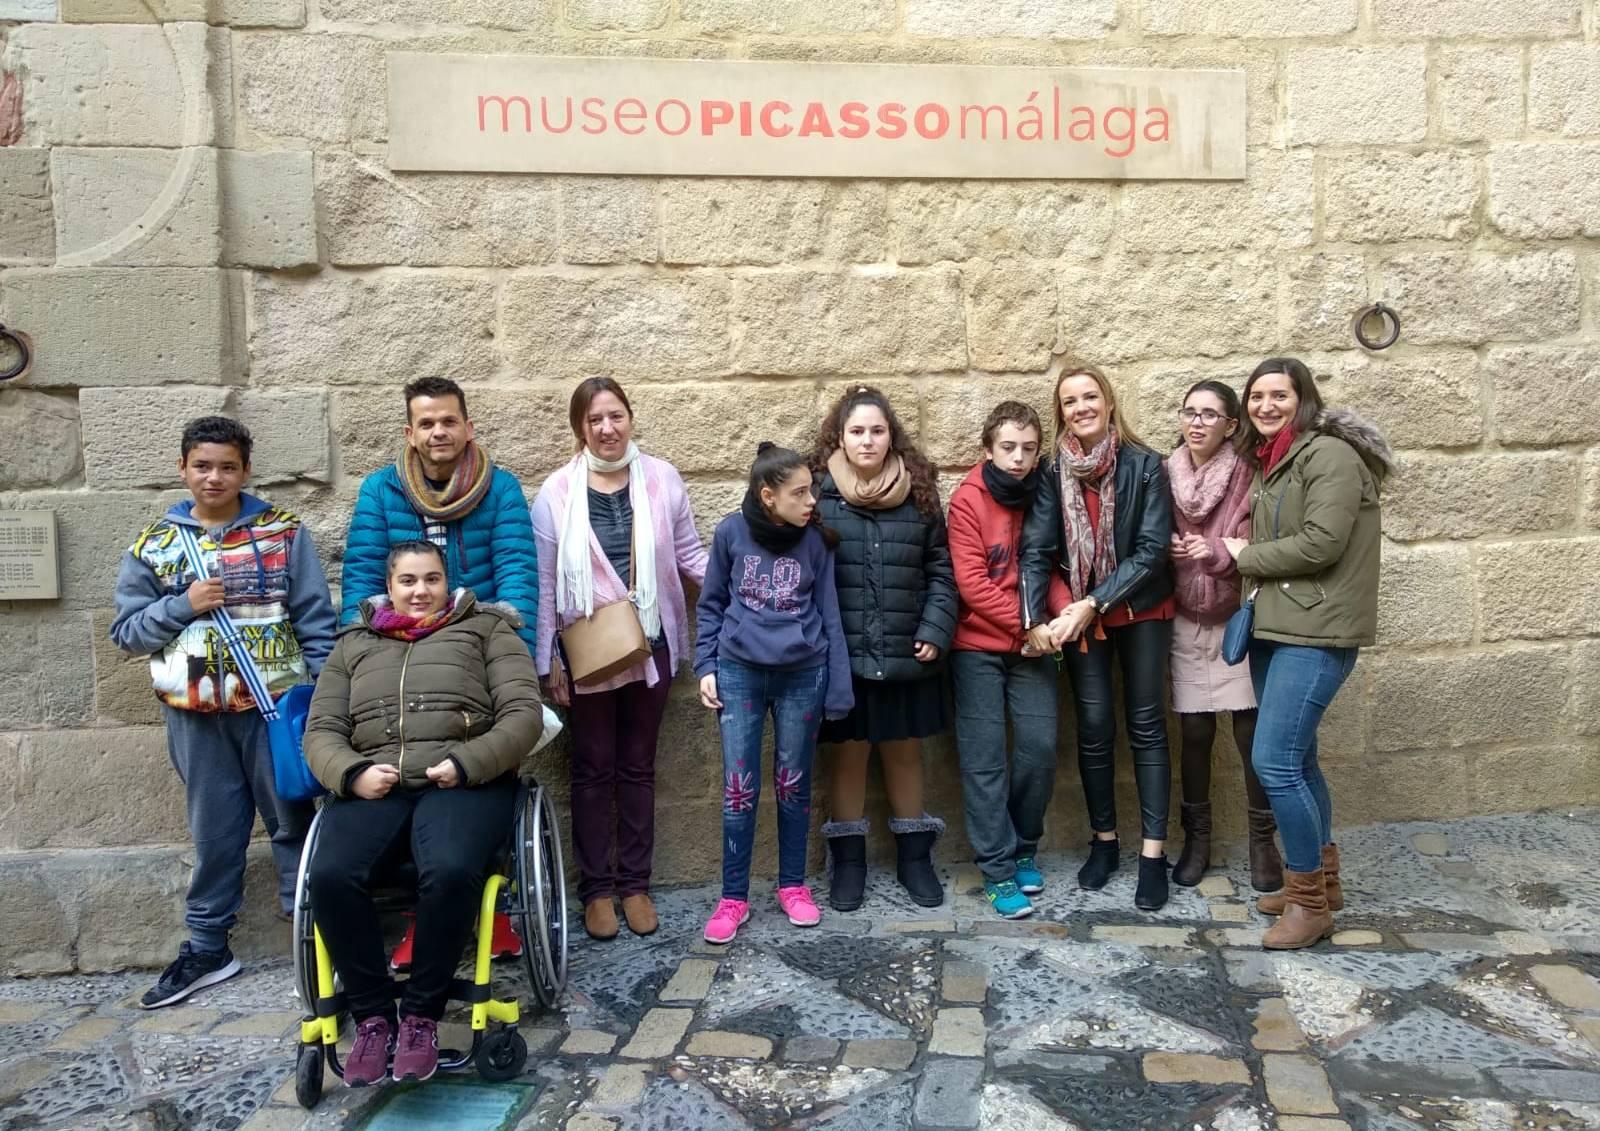 Visita – Taller al Museo Picasso Málaga